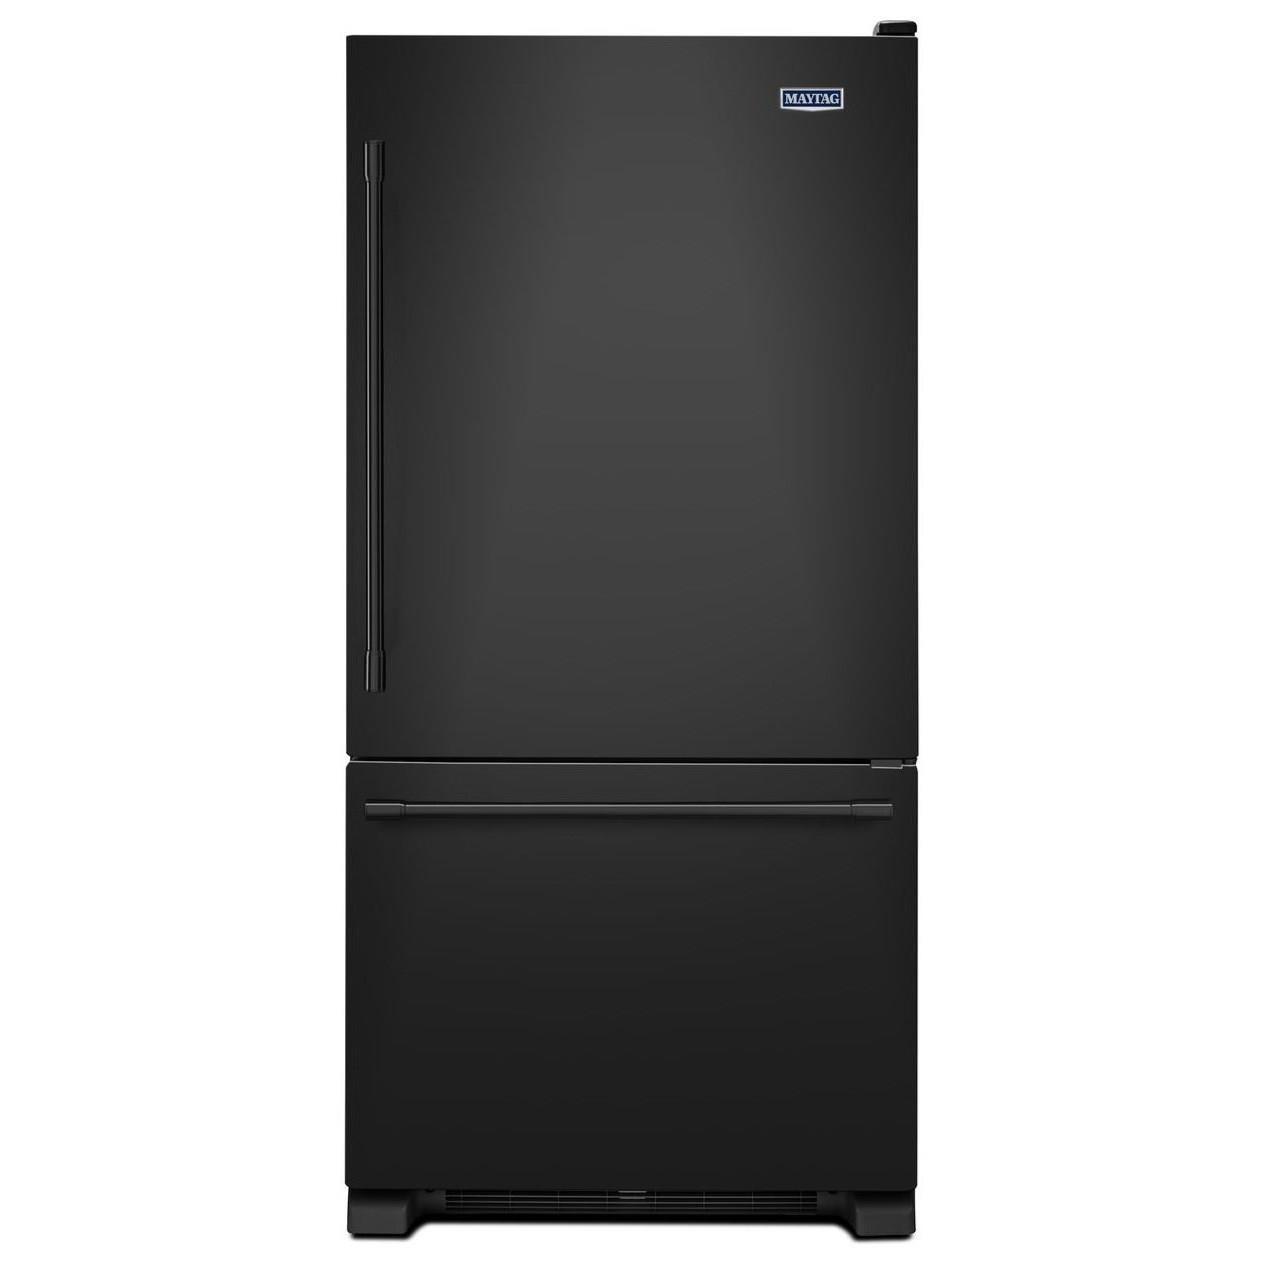 30-Inch 19 Cu. Ft. Bottom Mount Refrigerator